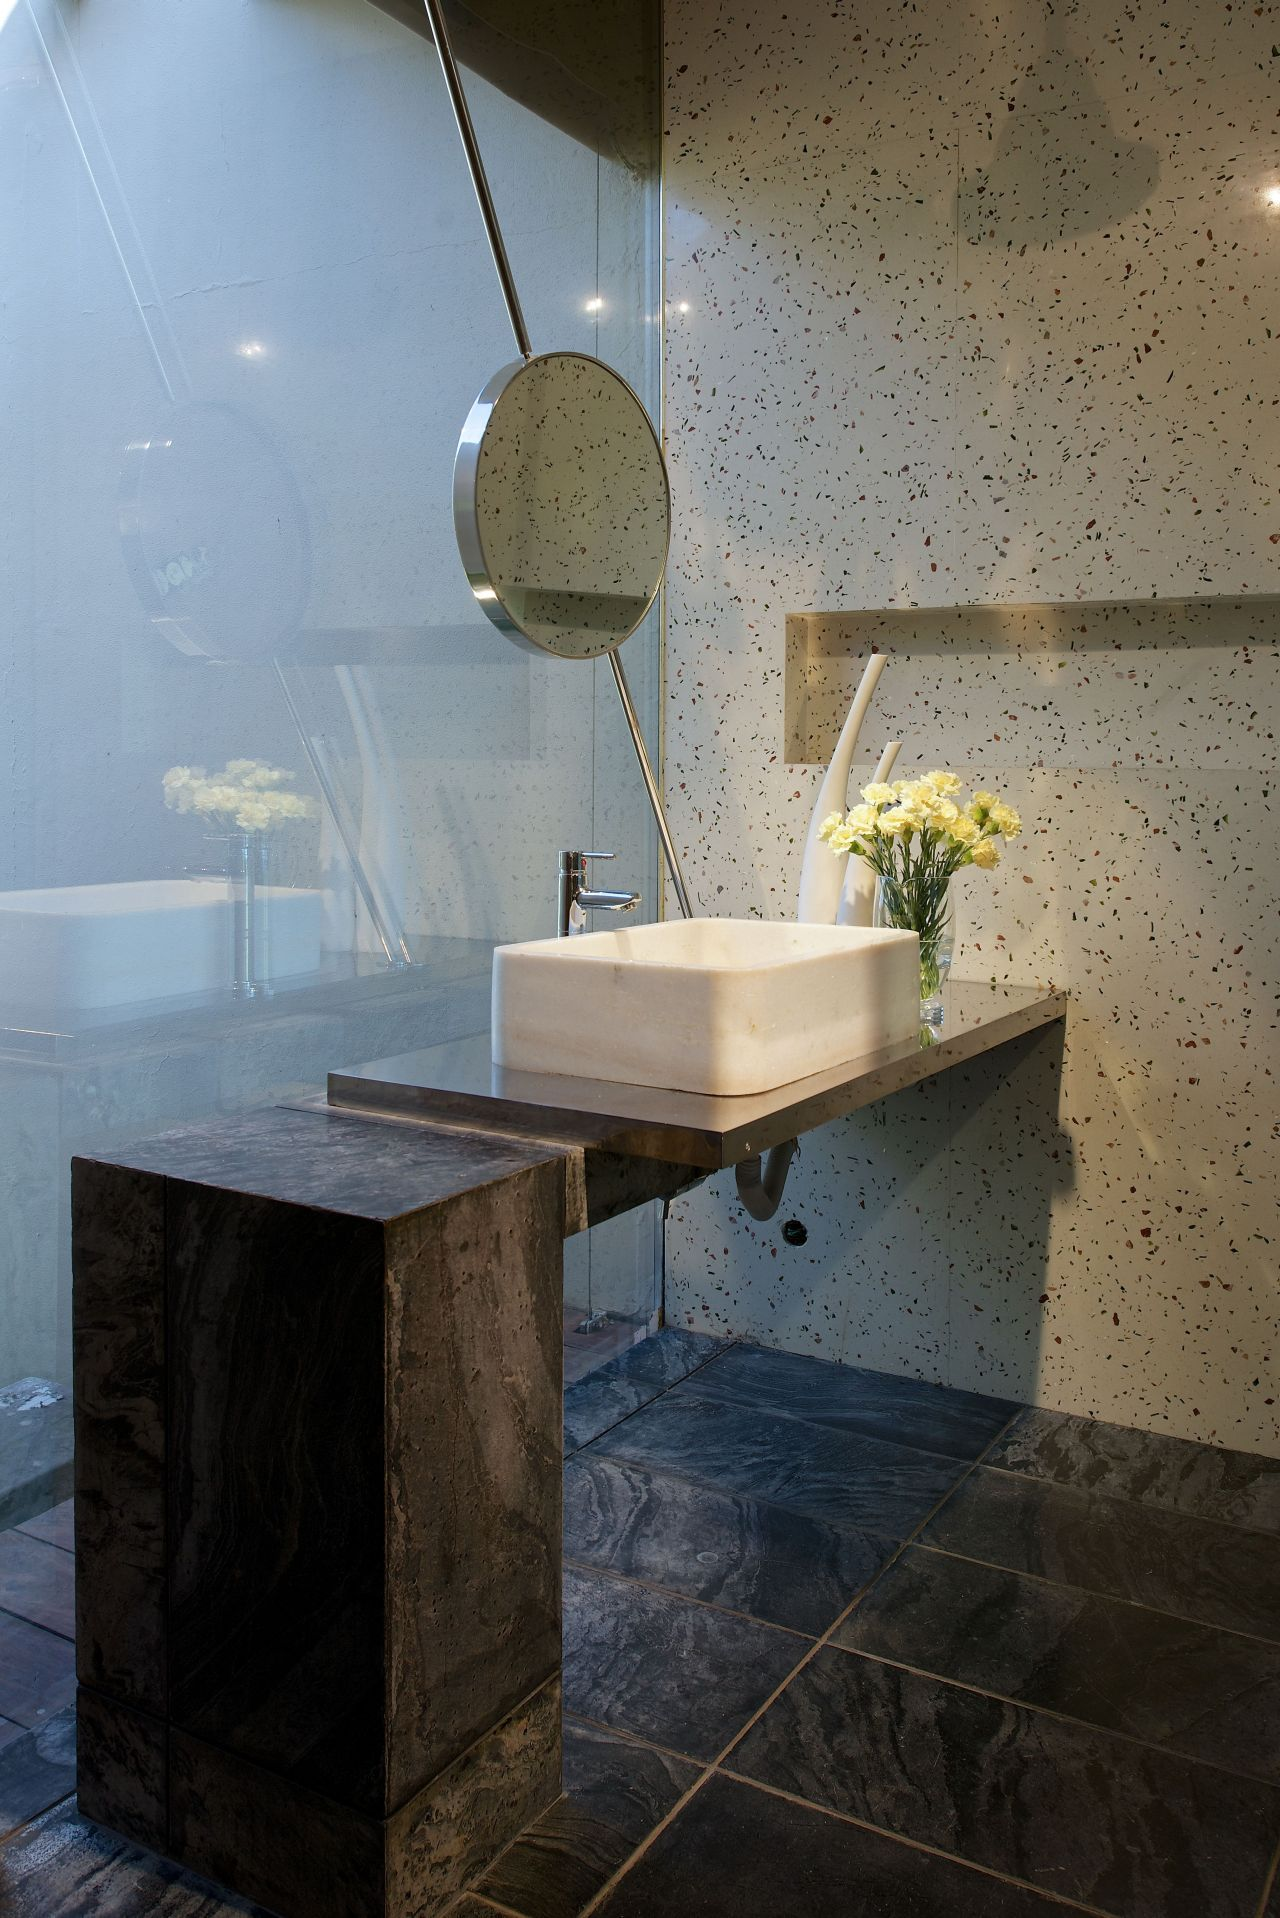 concrete bathroom sinks that make a